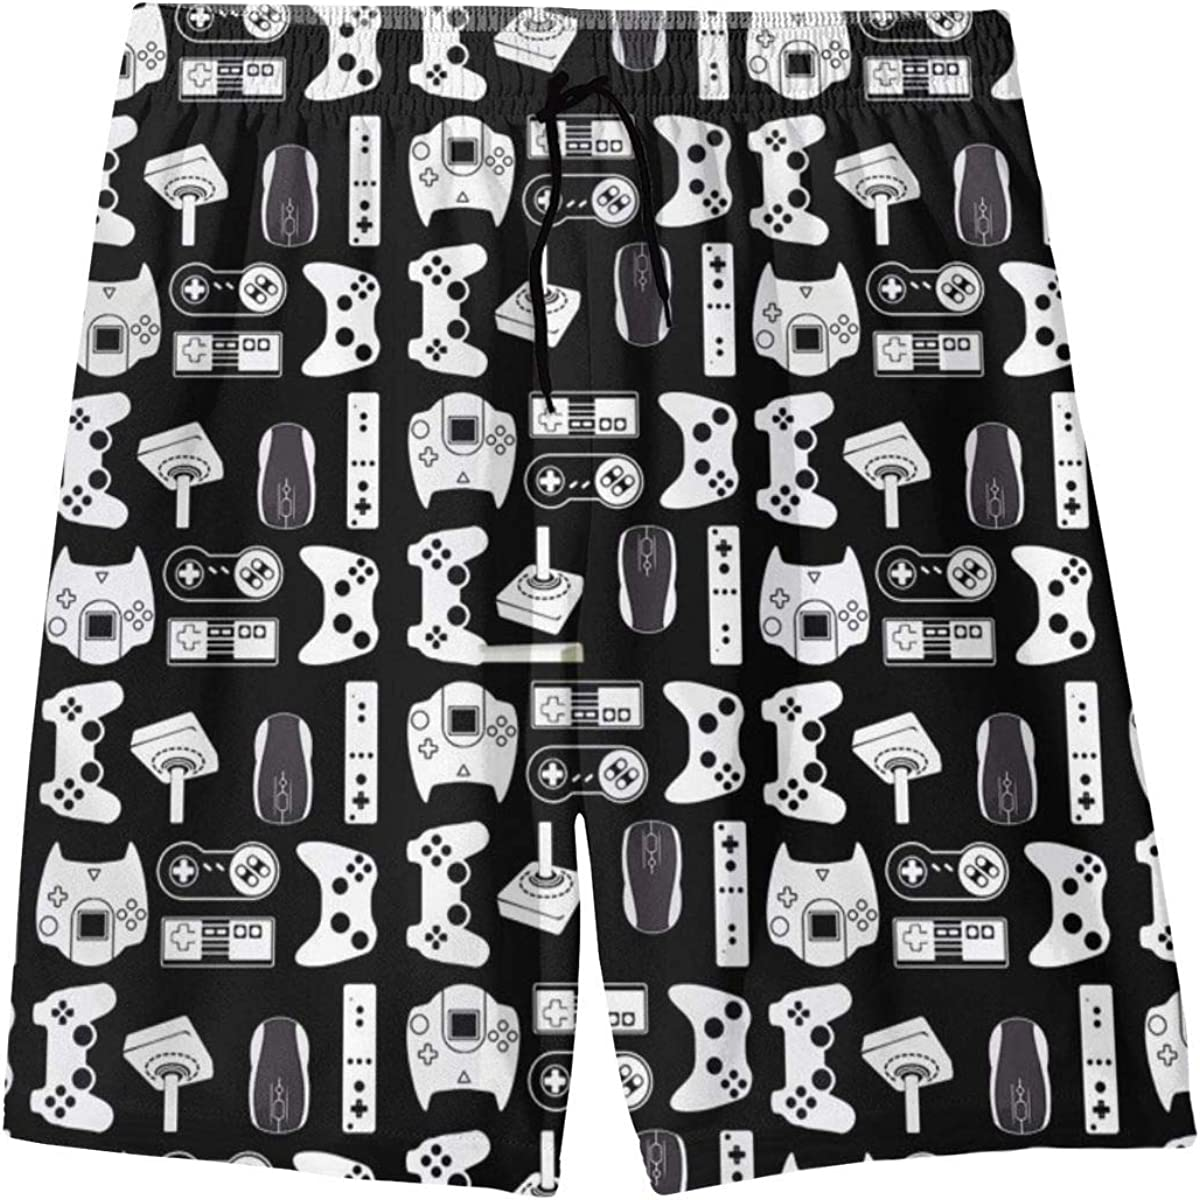 Black Video Game Weapon Funny Gamer Teenager Boys Beachwear Beach Shorts Pants Board Shorts